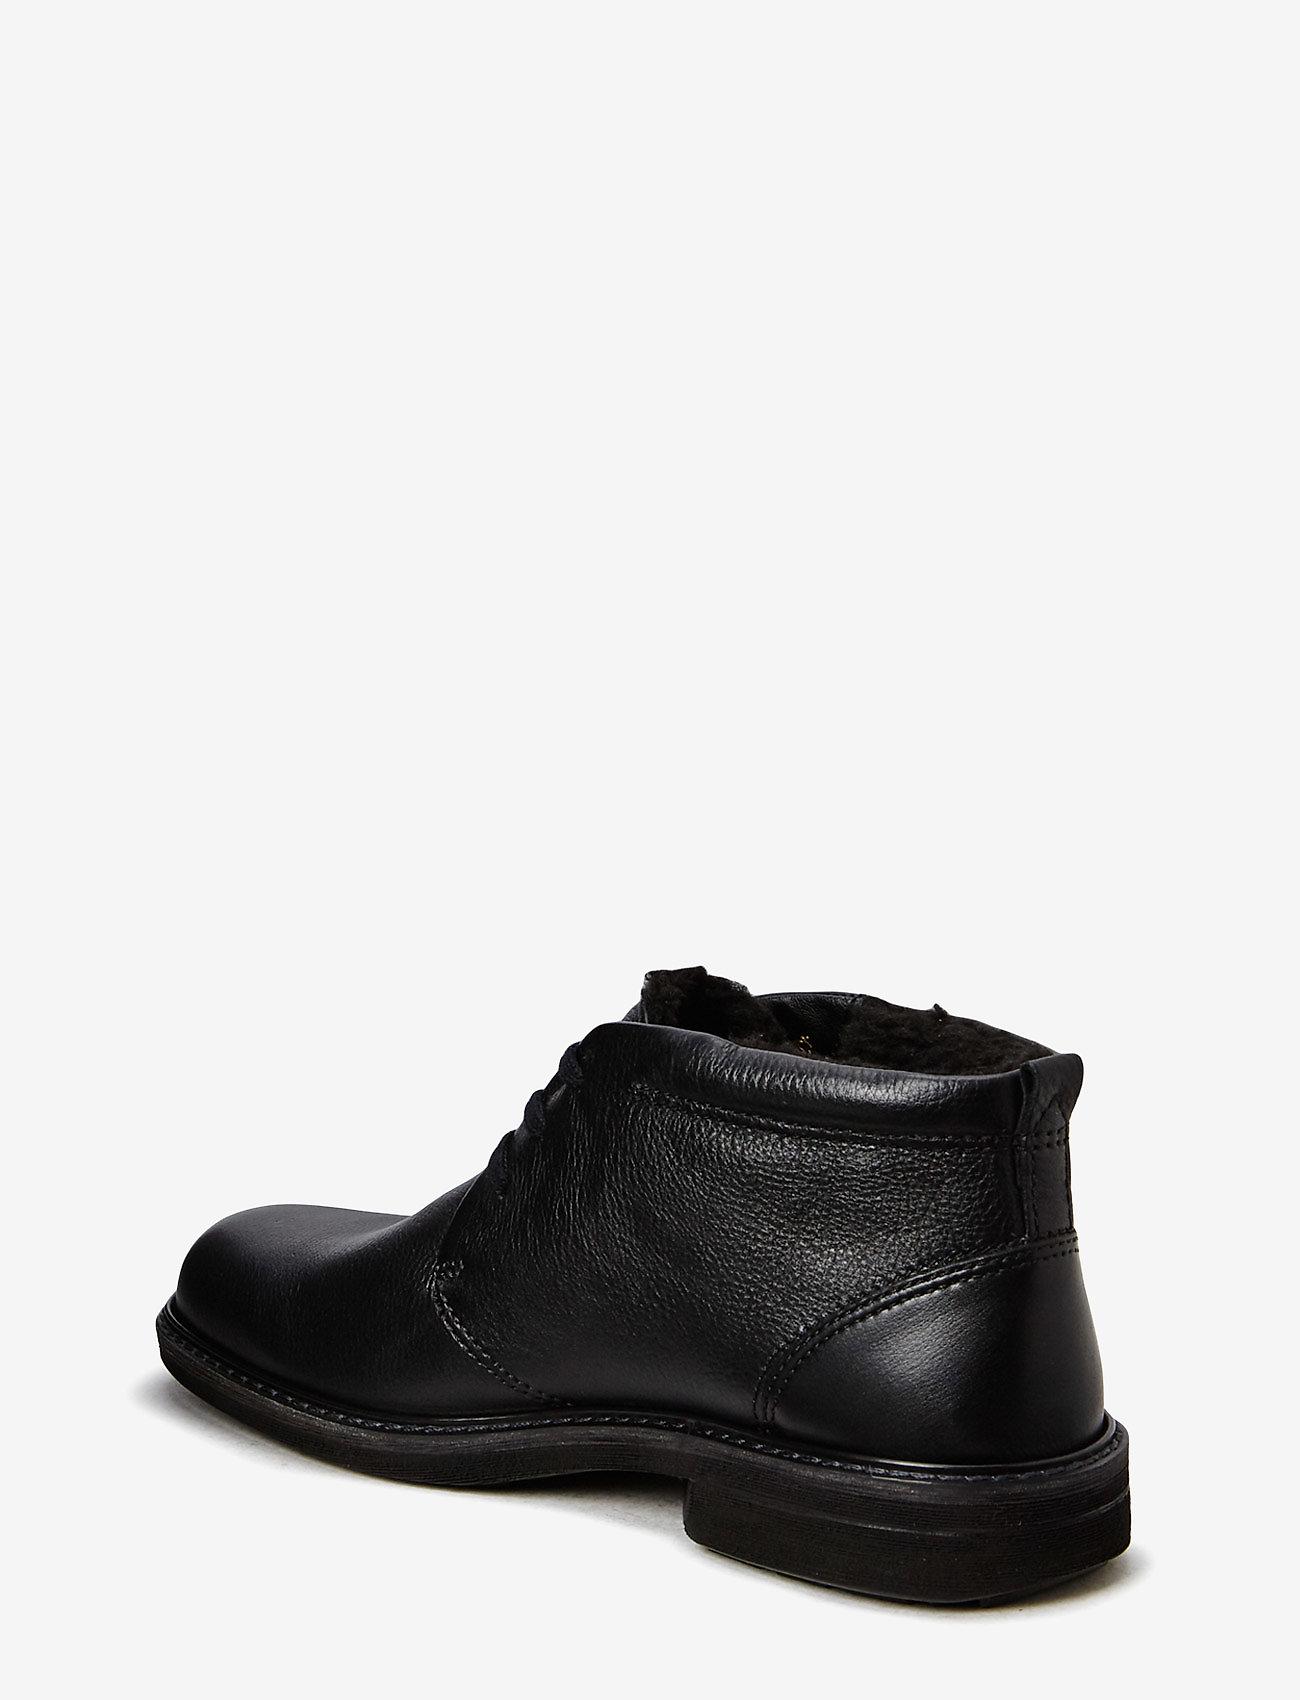 ECCO - TURN - desert boots - black - 1